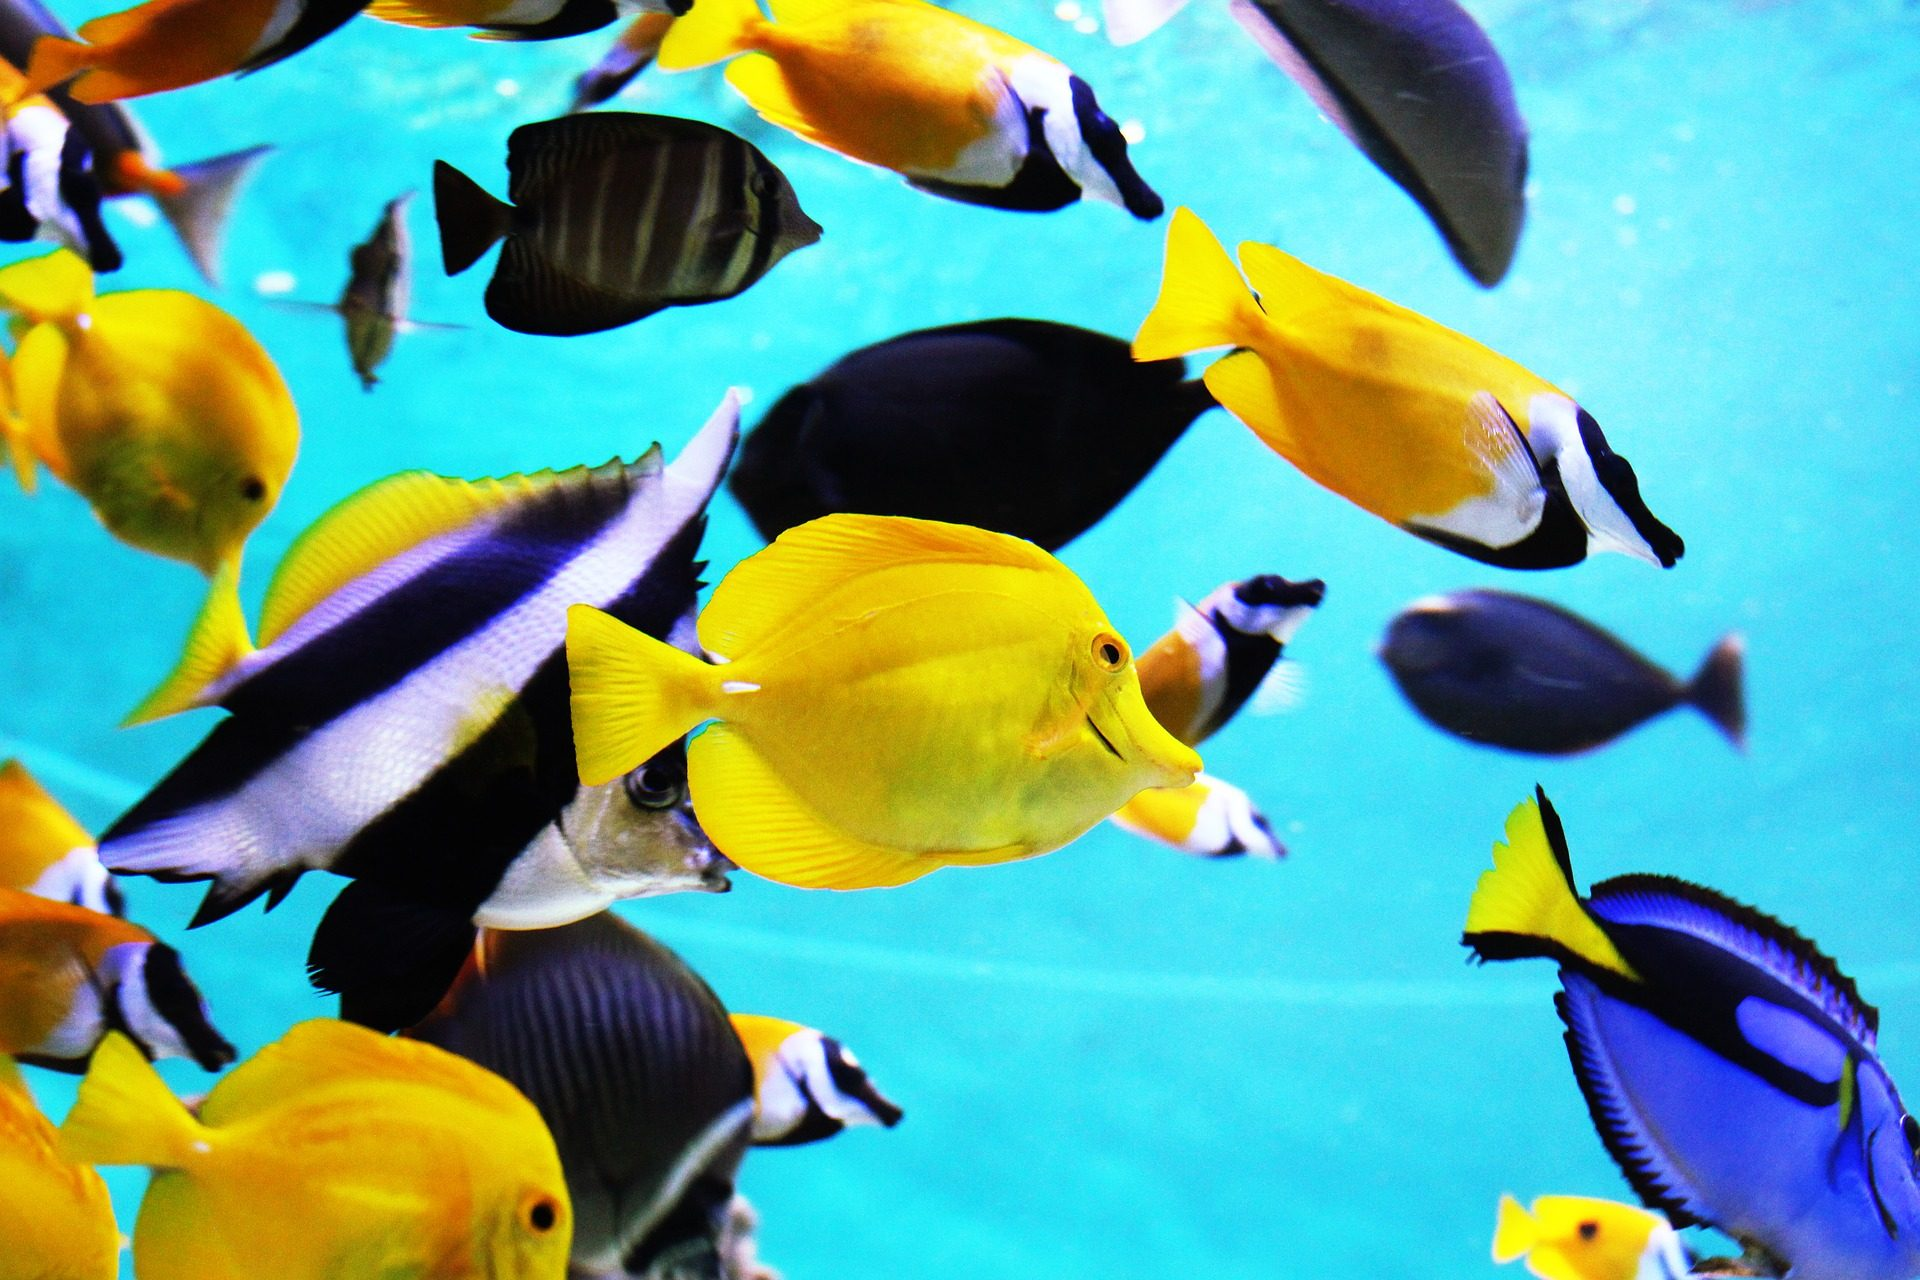 peces, tropicales, colorido, acuario, exóticos - Fondos de Pantalla HD - professor-falken.com